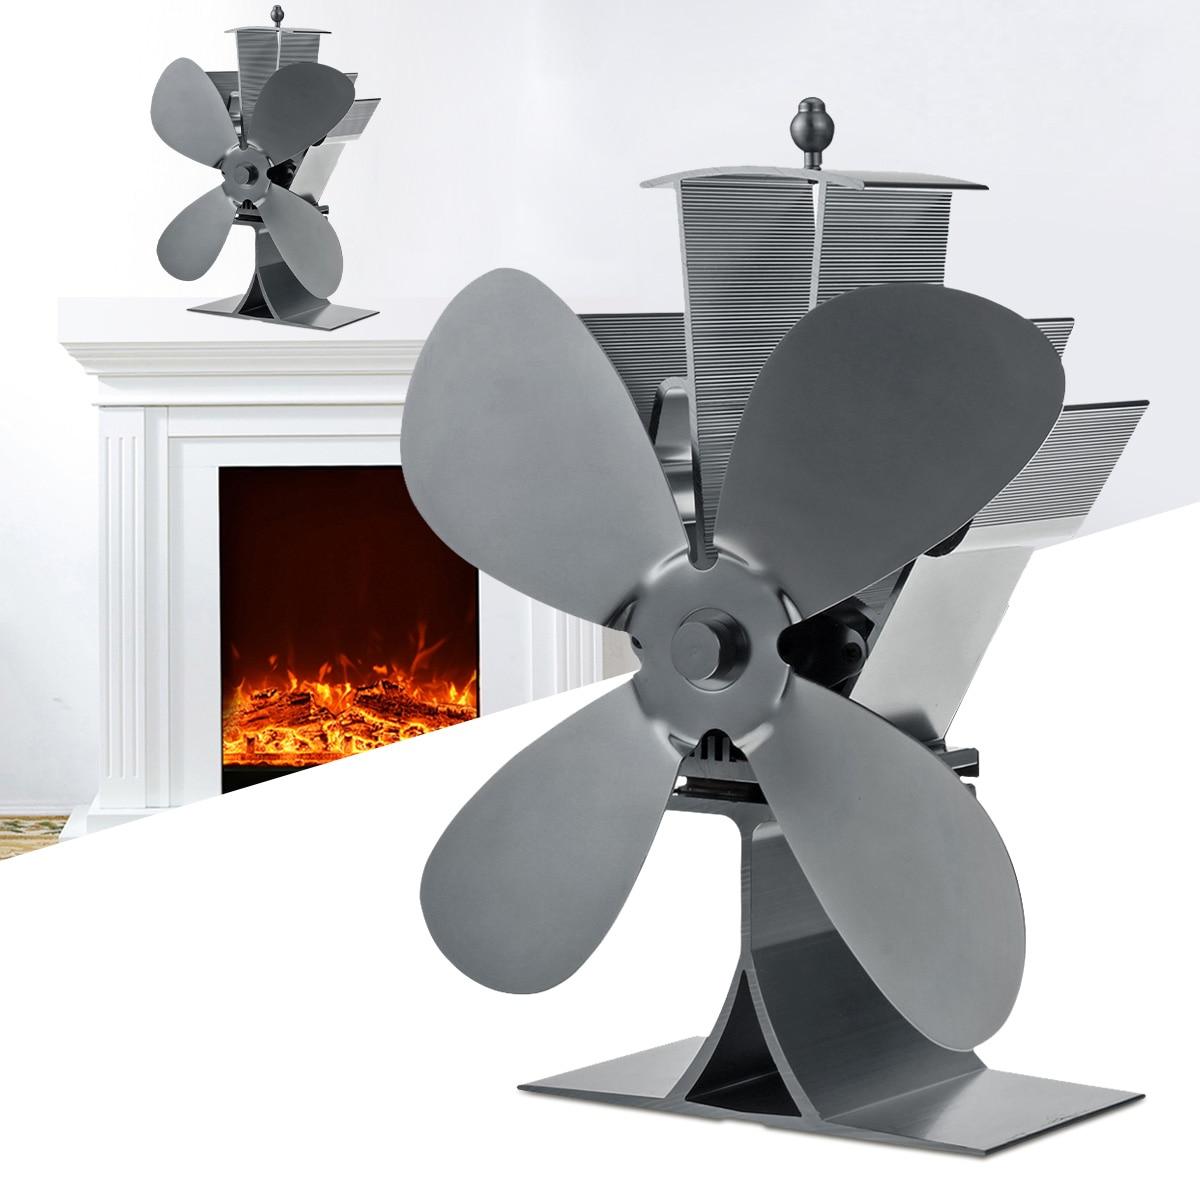 4 Blade Aluminum Fireplace Fan 1100rpm Quiet Heat Powered Stove Fan Wood Burning Eco-Friendly Efficient Heat Distribution